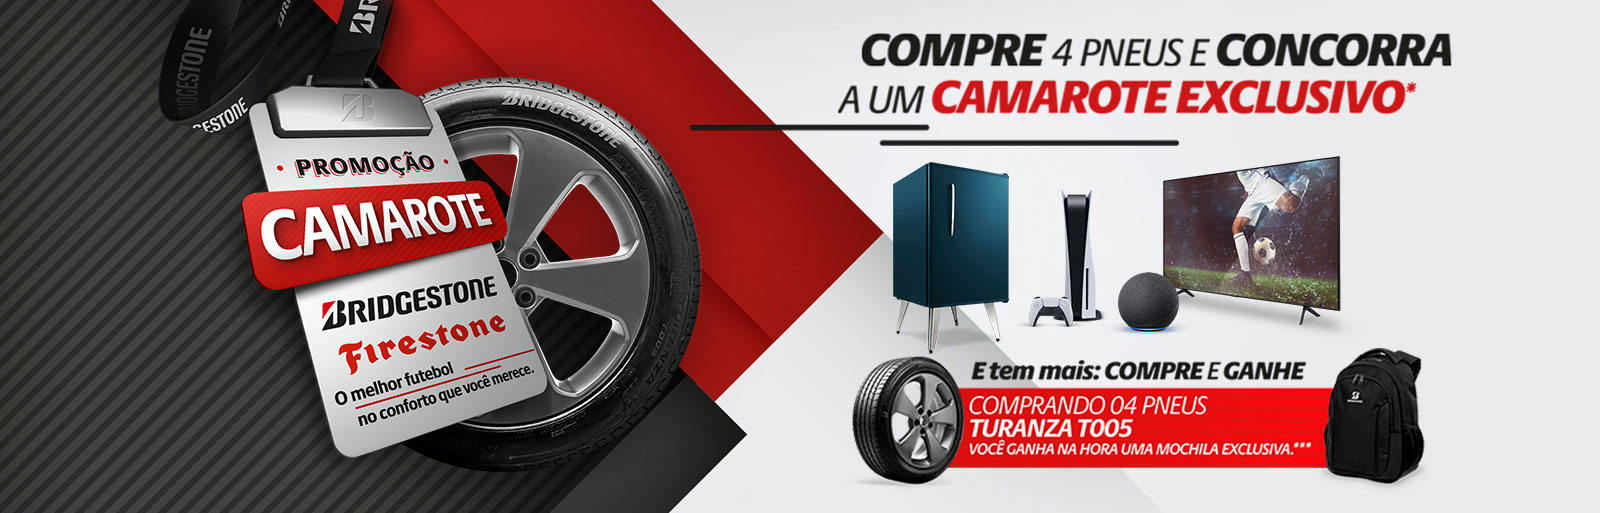 Promoção Camarote Bridgestone